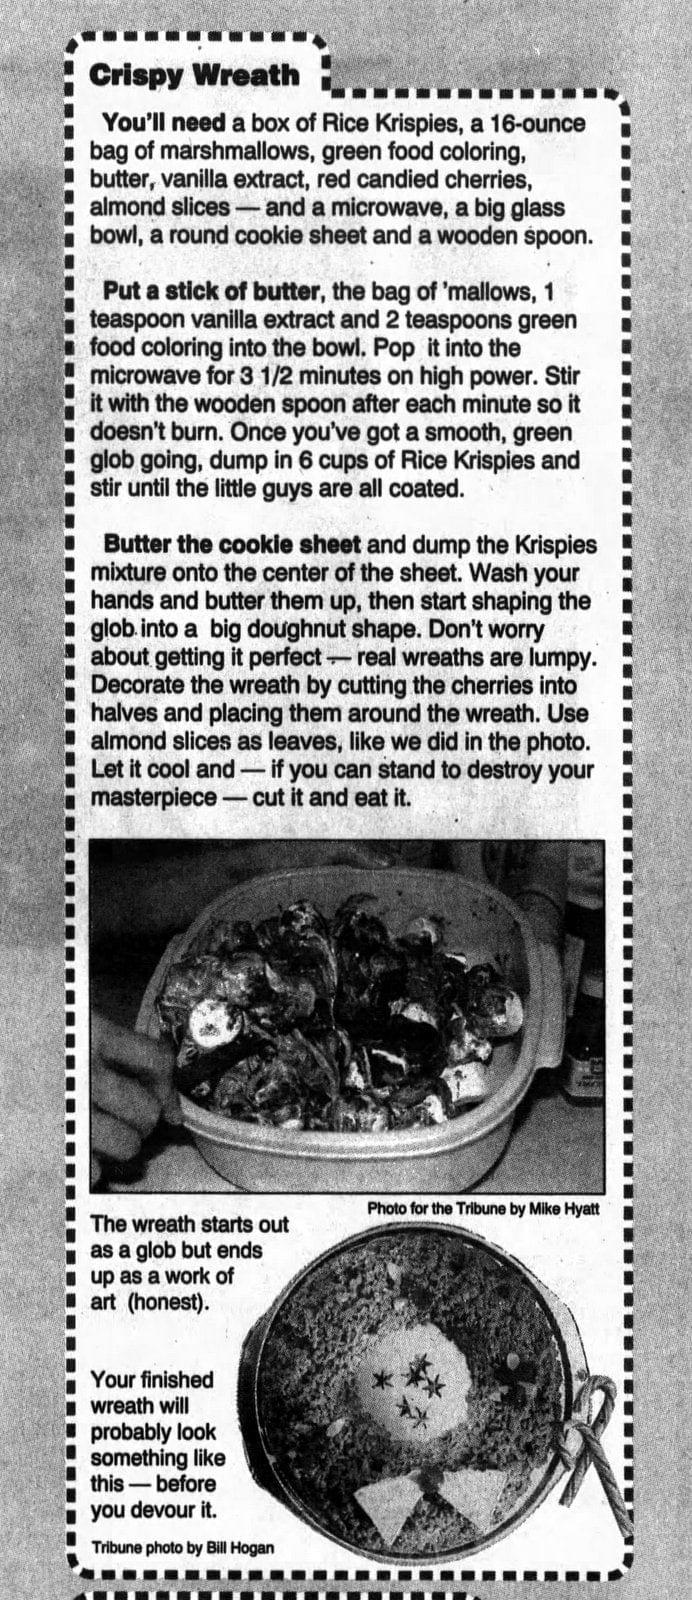 How to make a crispy wreath for Christmas (1992)